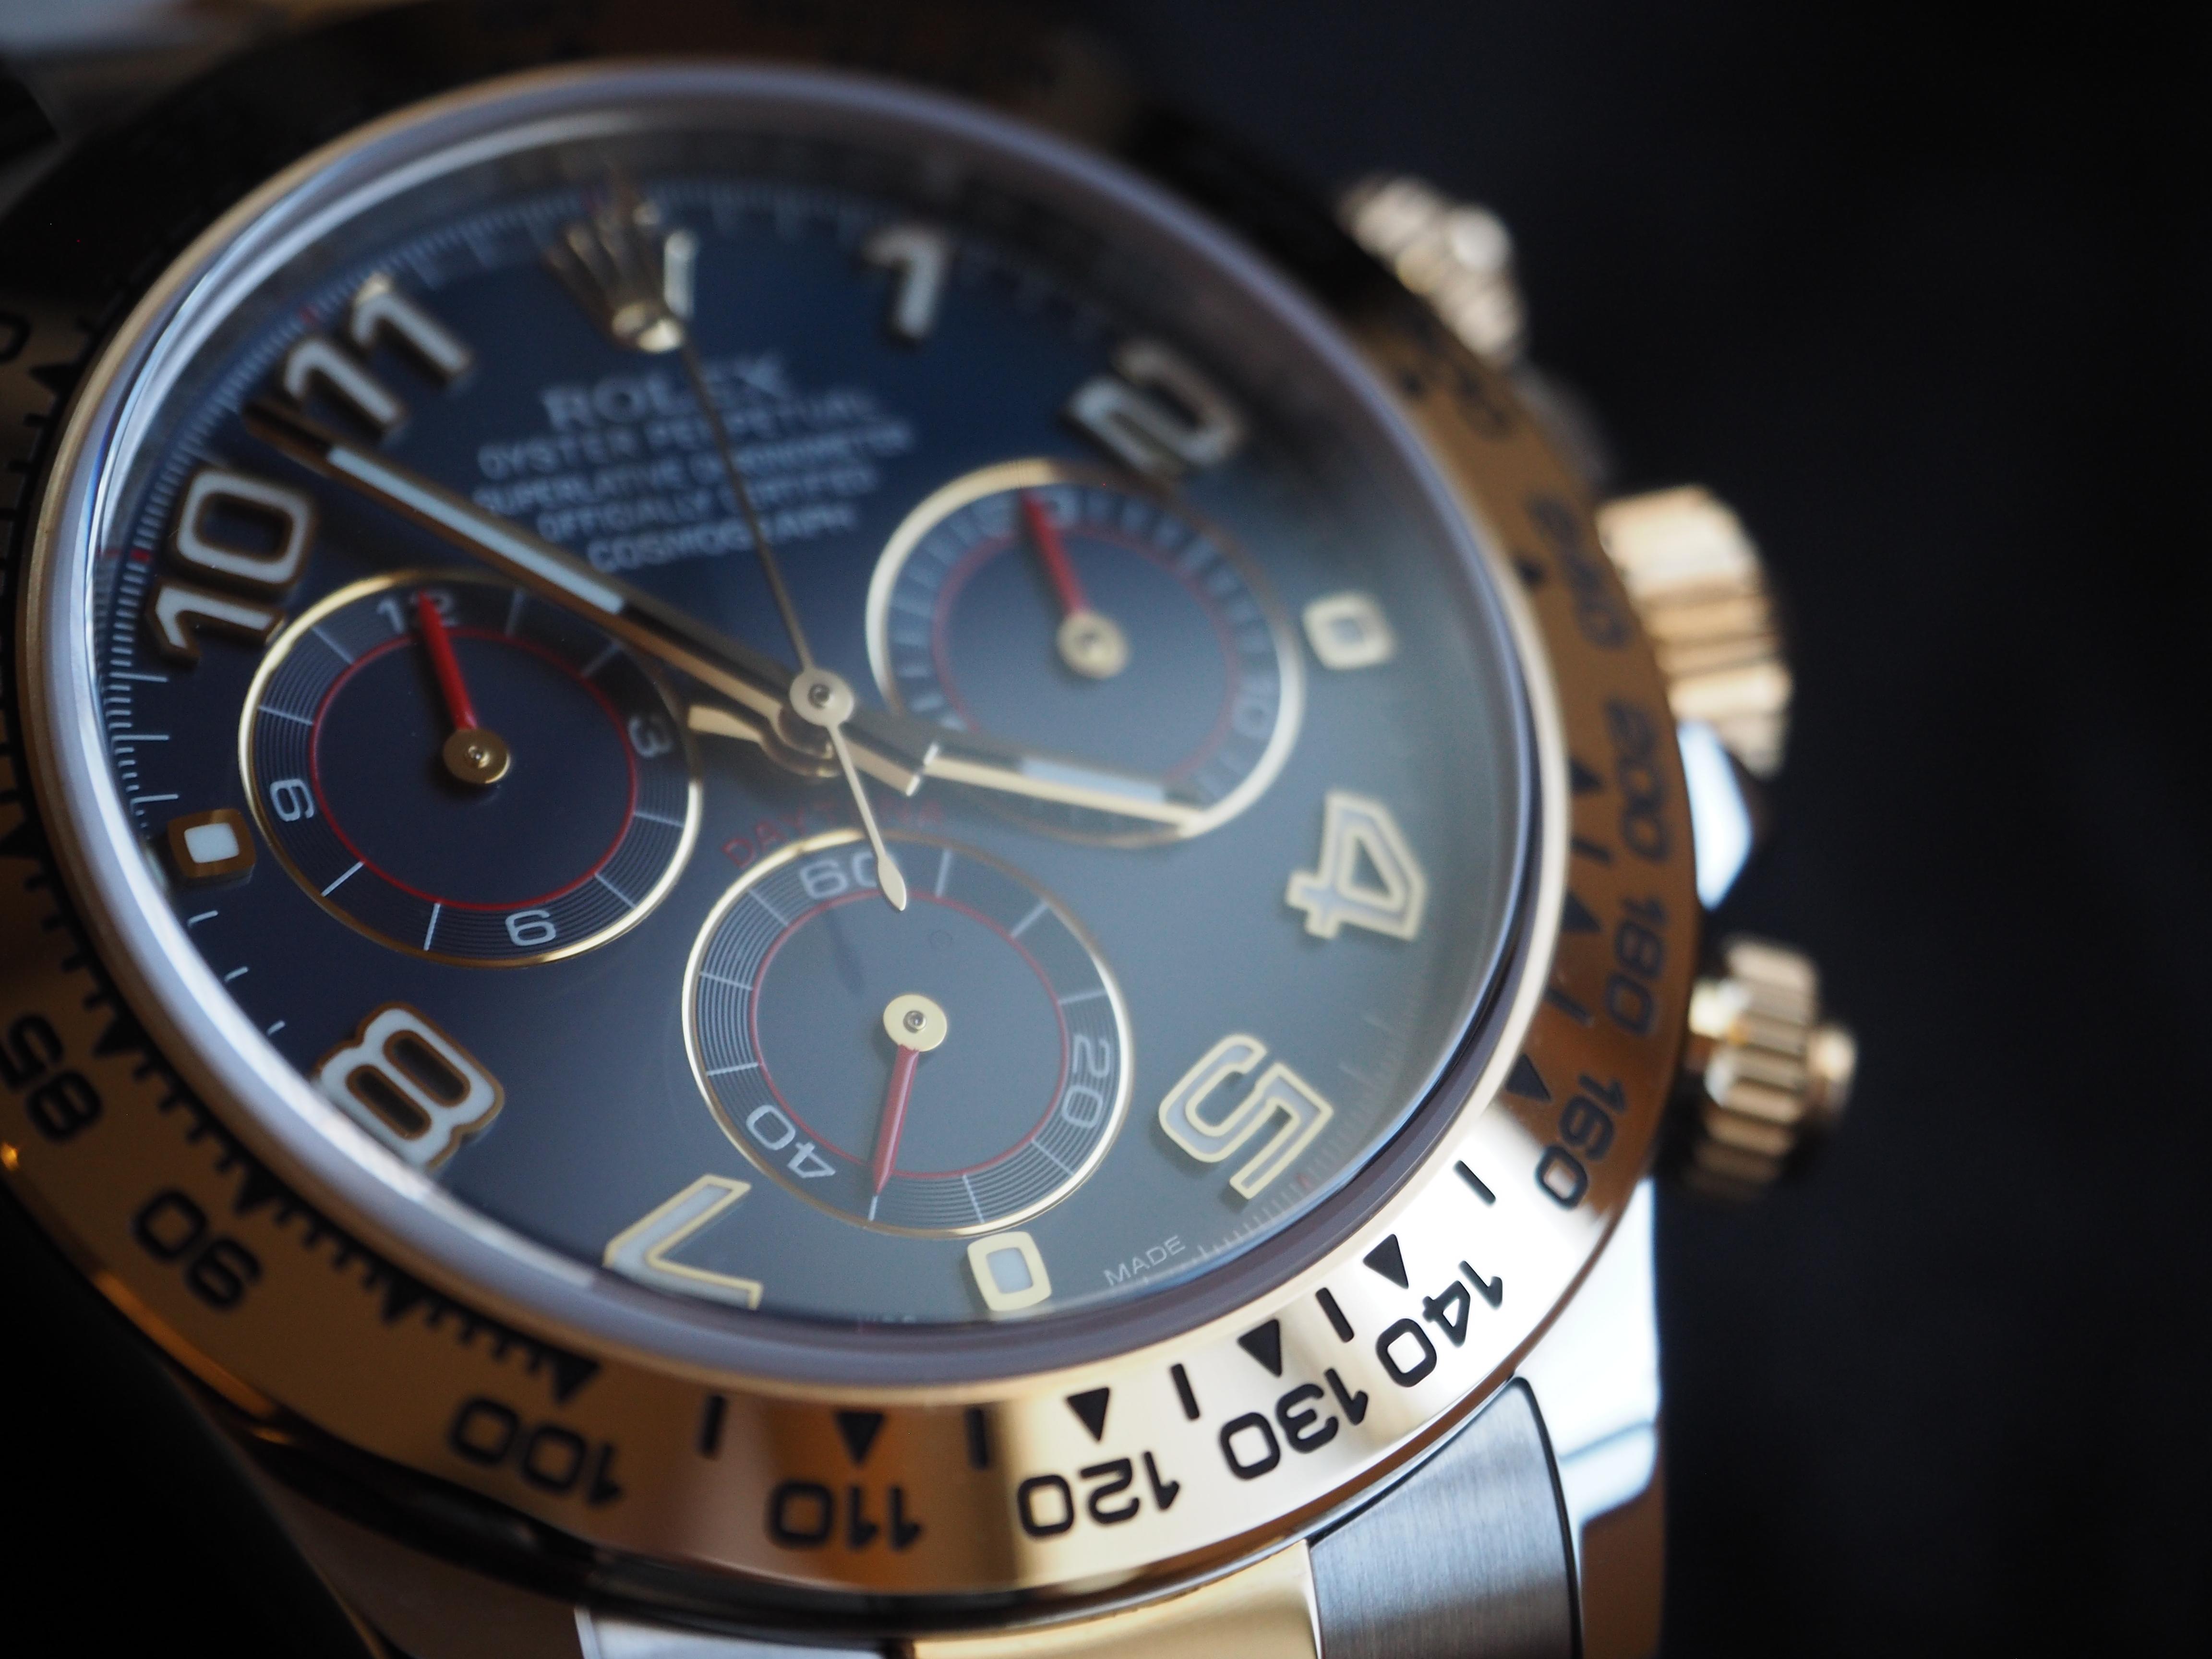 reputable site ce5ce 696e7 30男のデイトナ購入記(116503)①-腕時計の適正サイズを考える ...